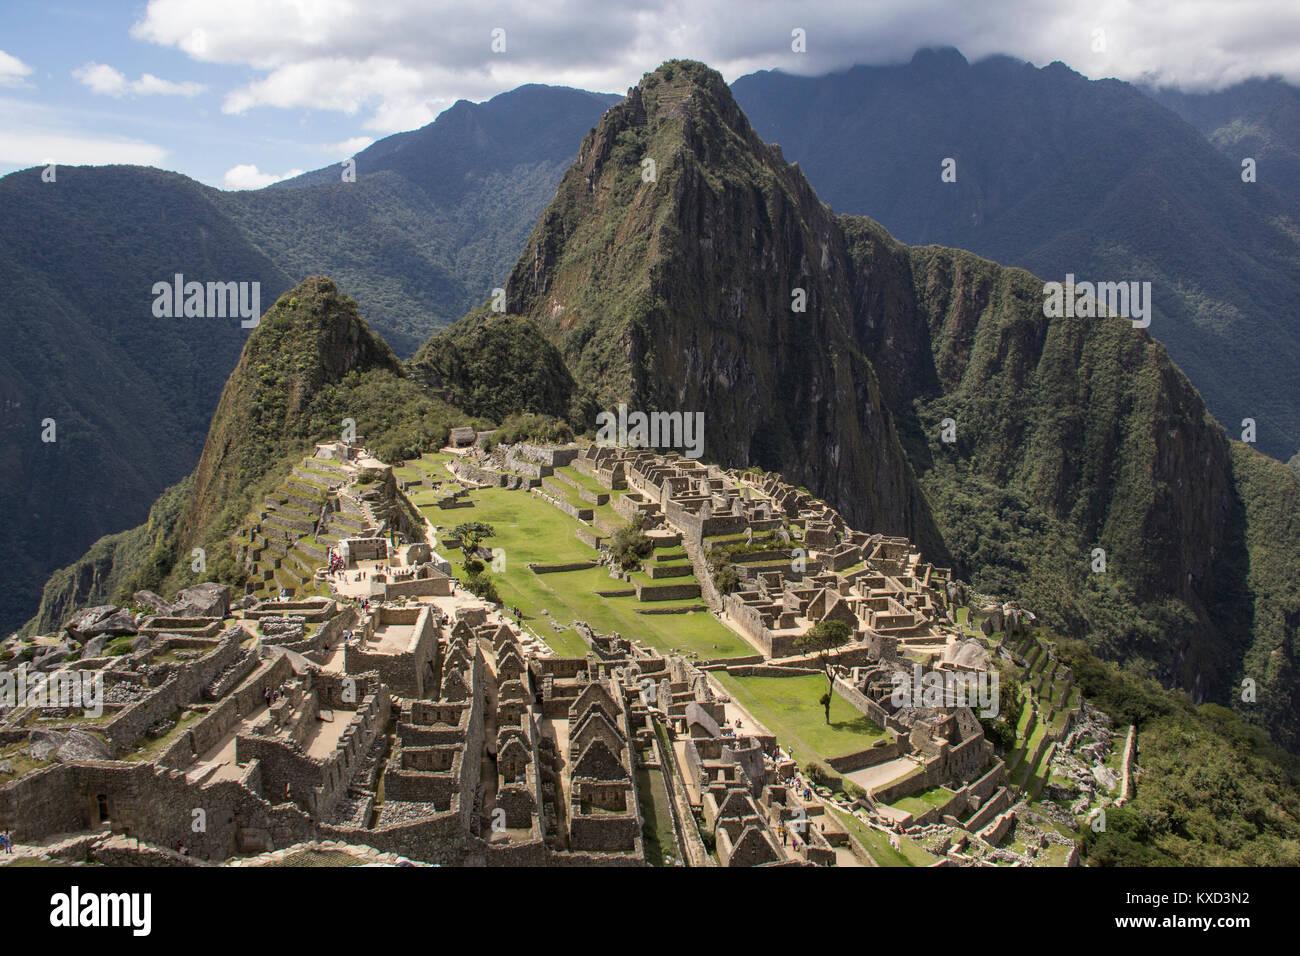 Hohe Betrachtungswinkel von Alt gegen Berge Ruine Stockbild